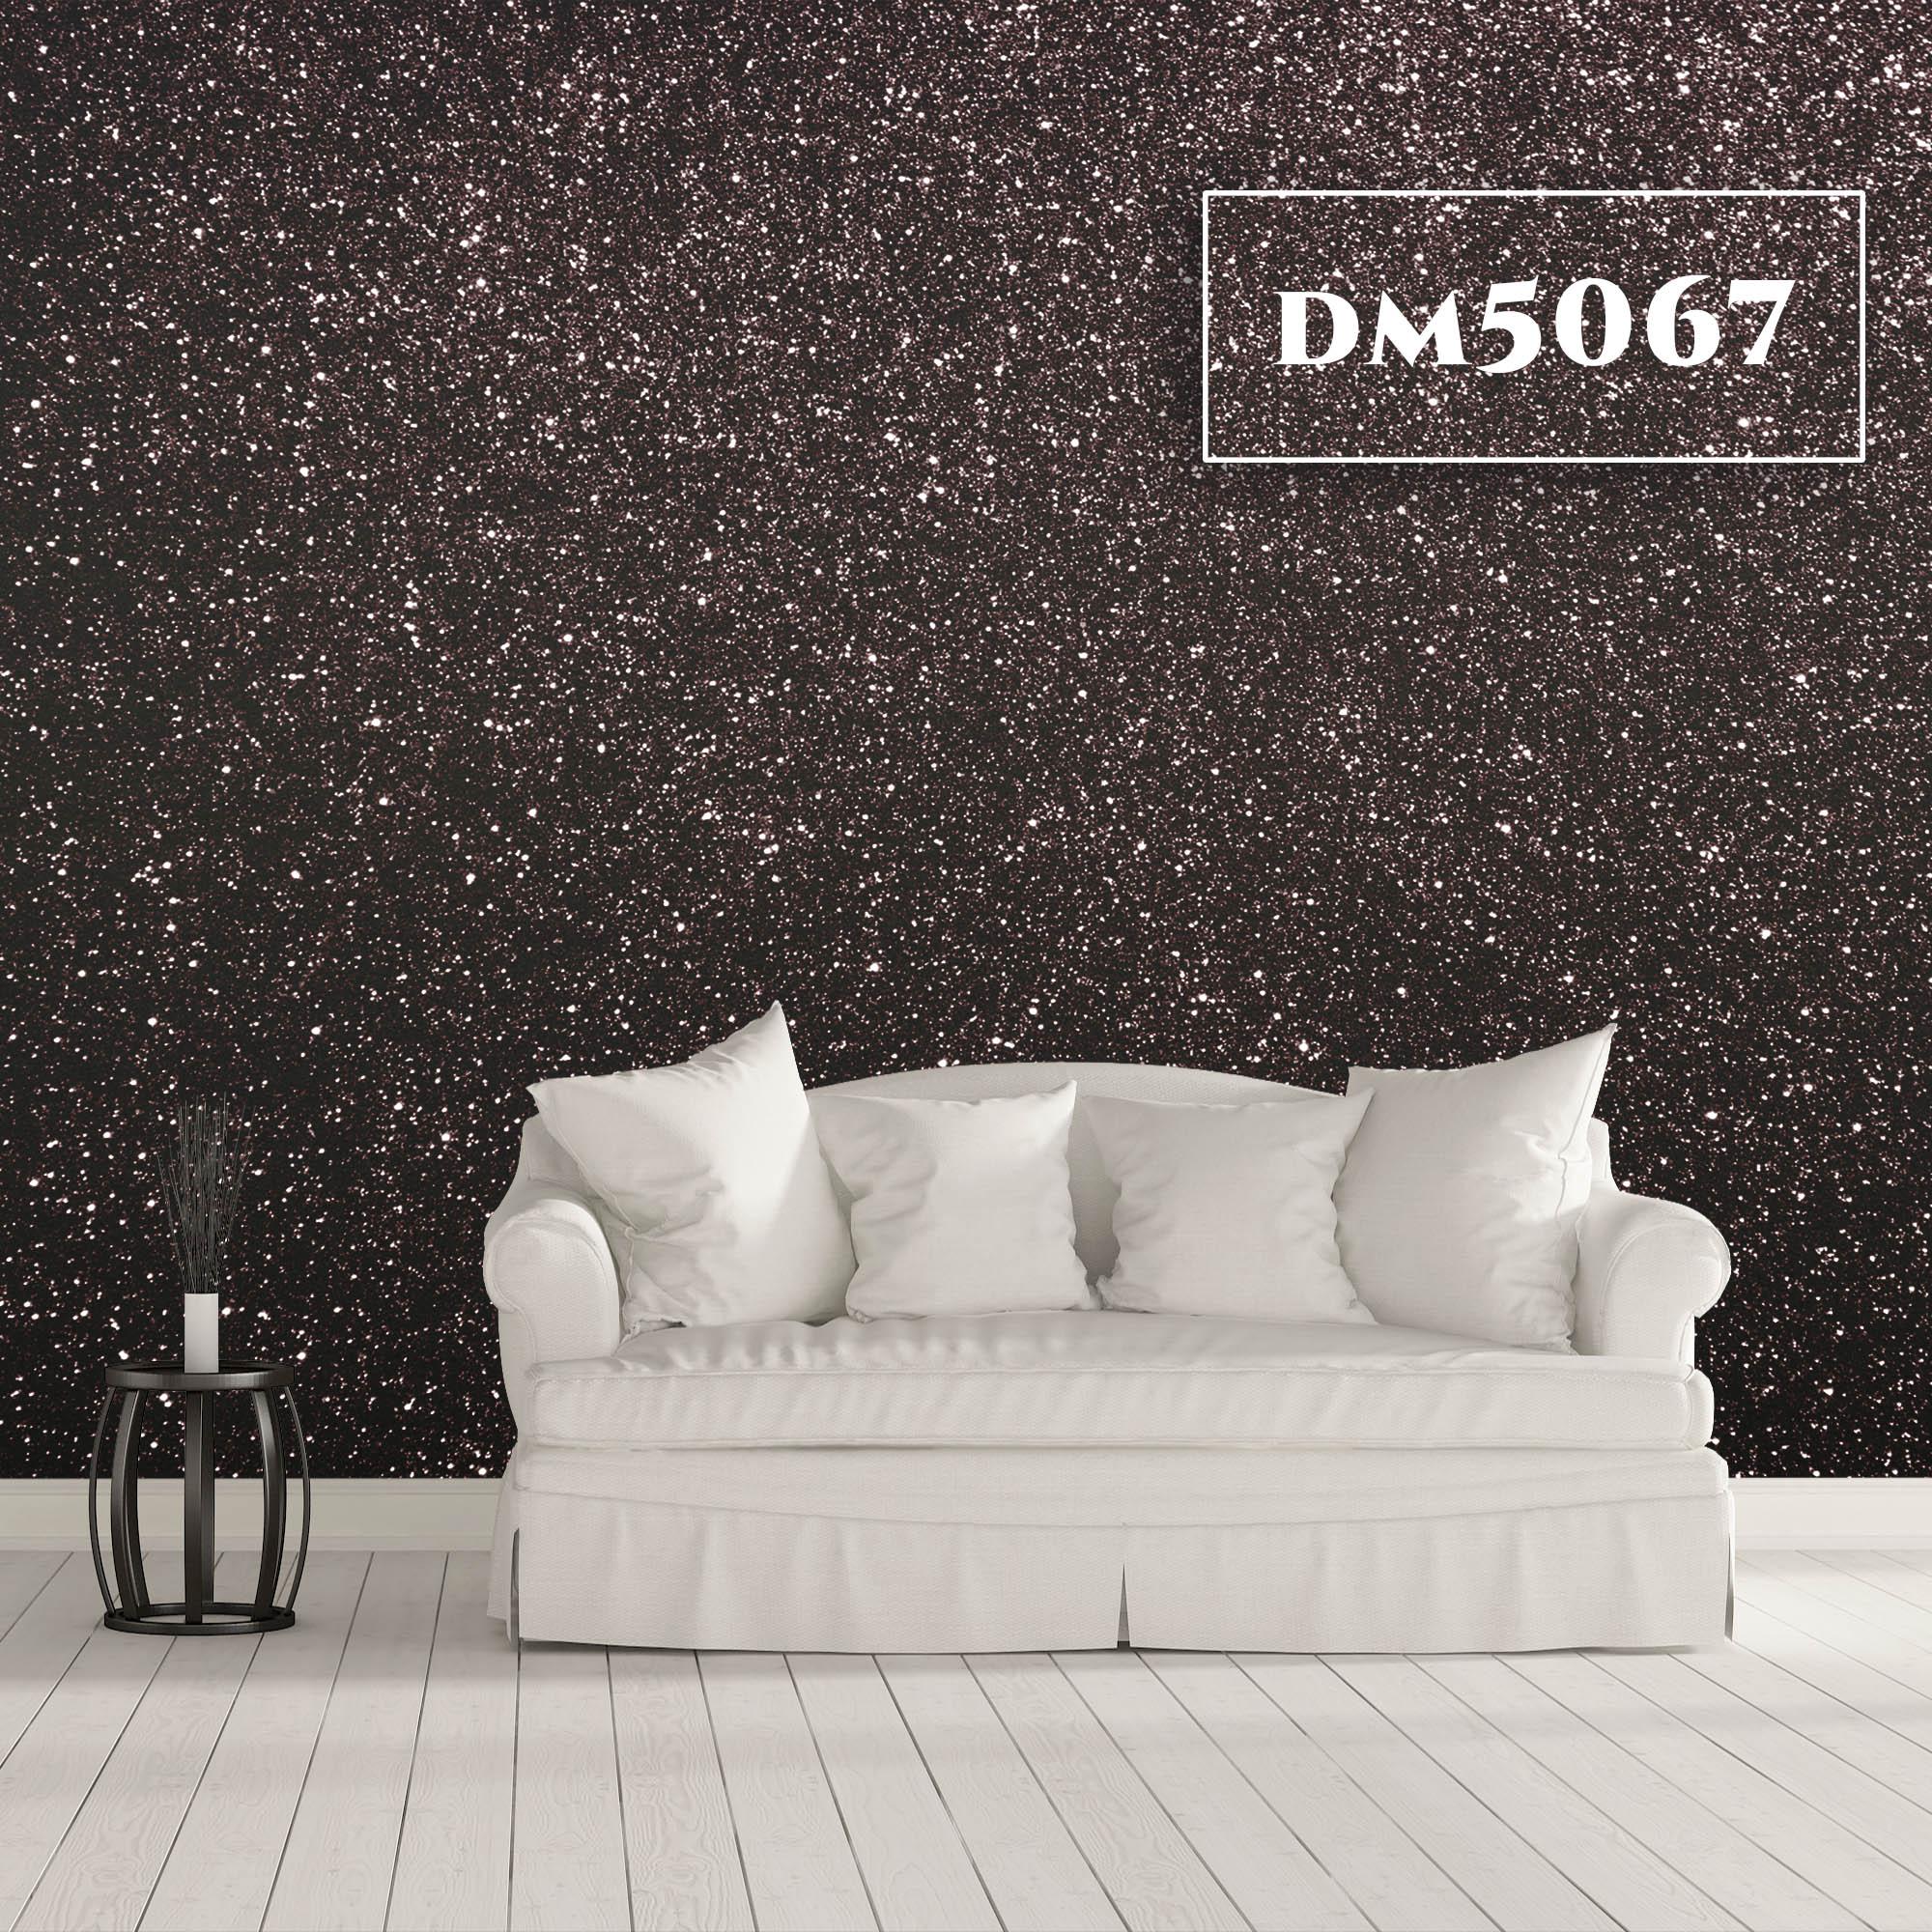 DM5067